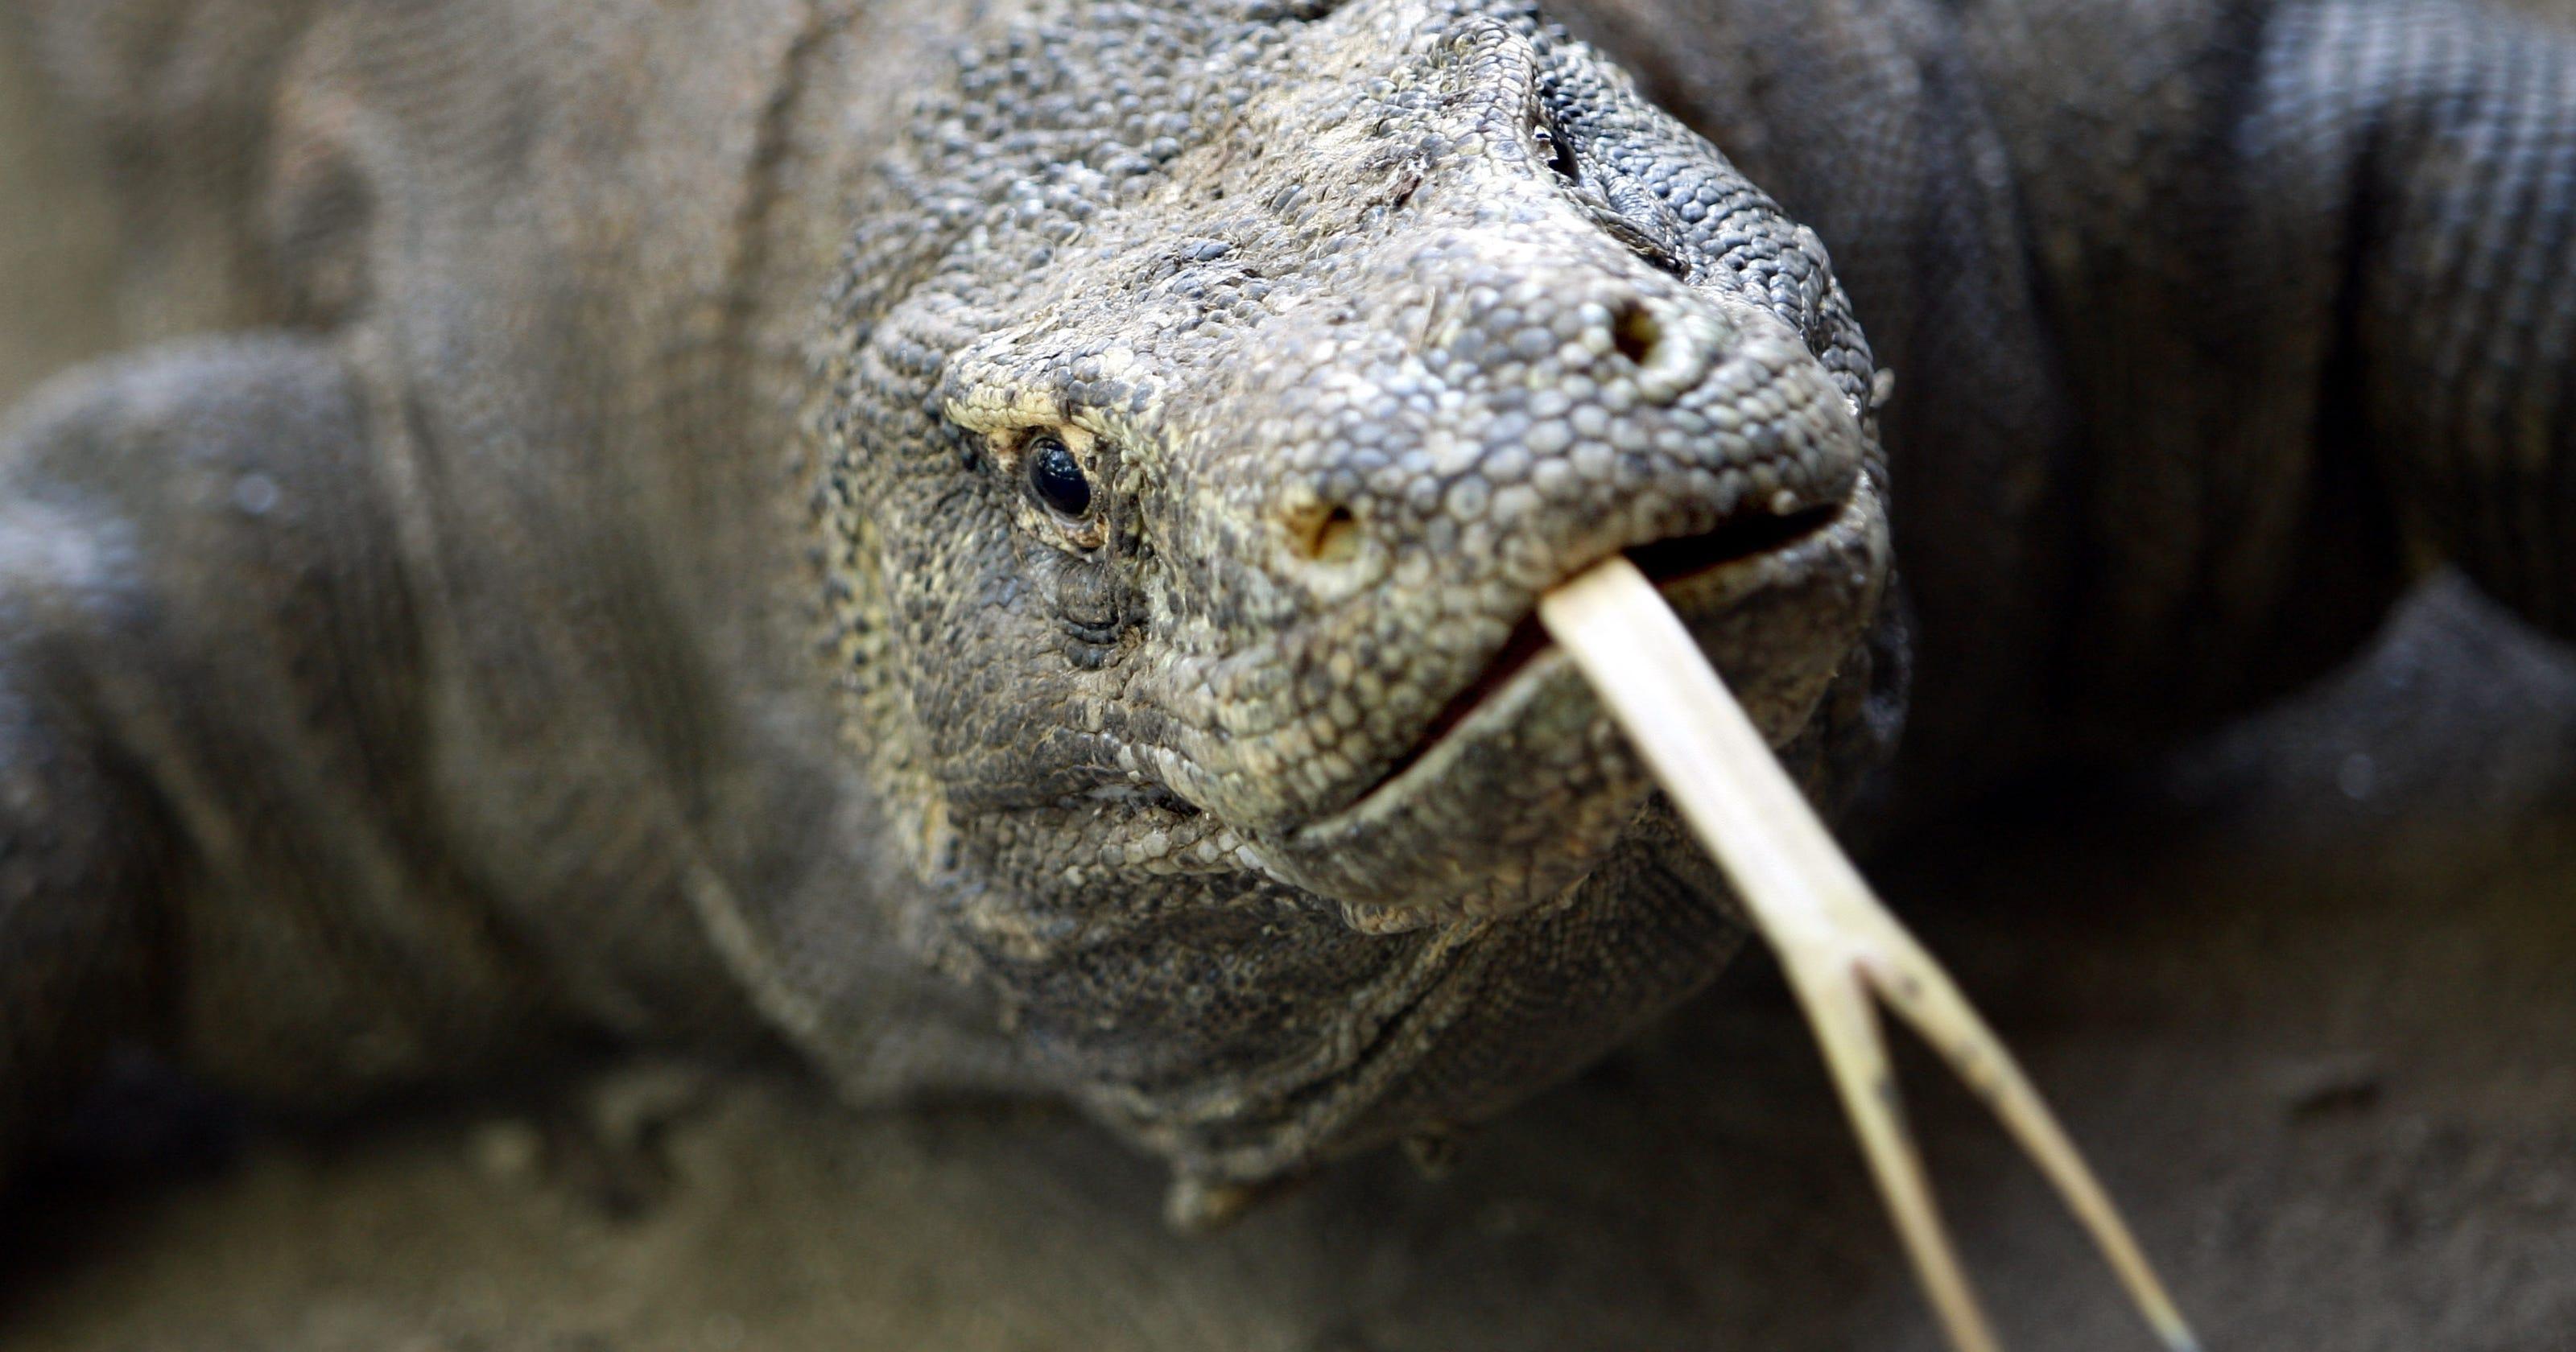 Komodo dragon lumbering into Calgary Zoo | Calgary Herald